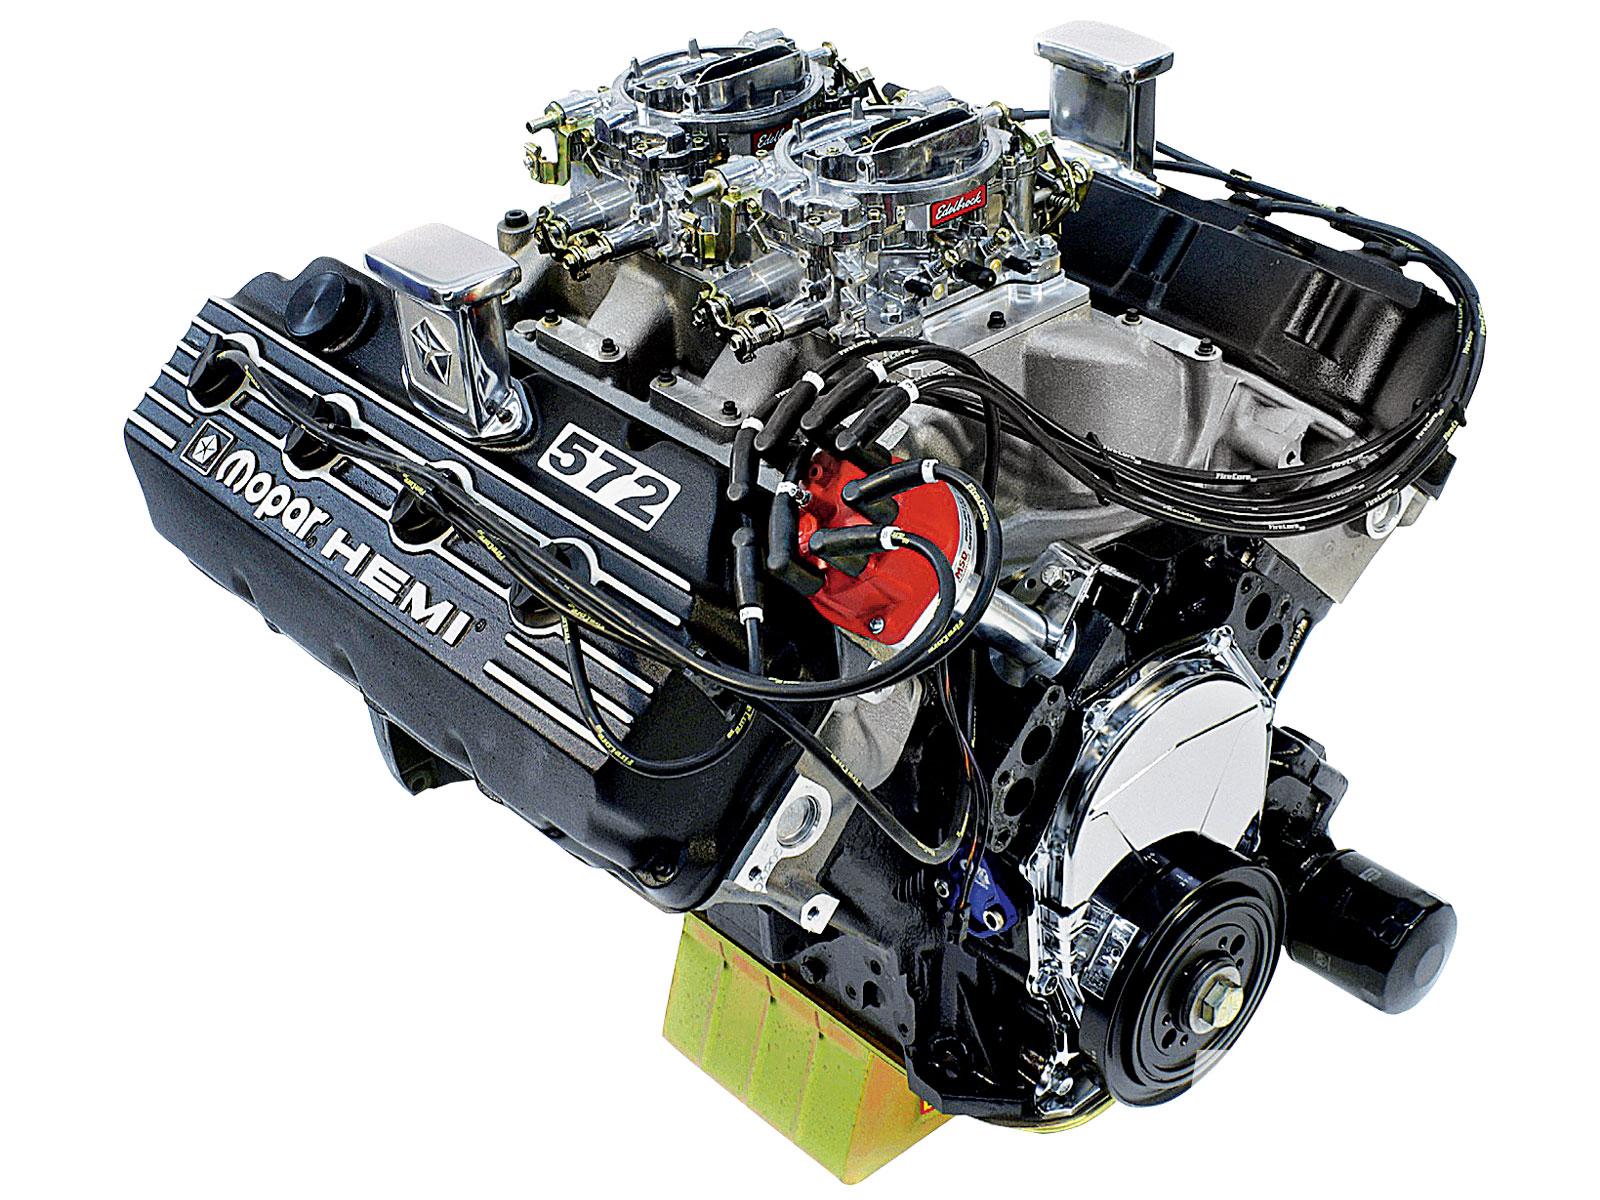 7 tiny engines that prove bigger isn't always better 572 Crate 572 Hemi  Engine